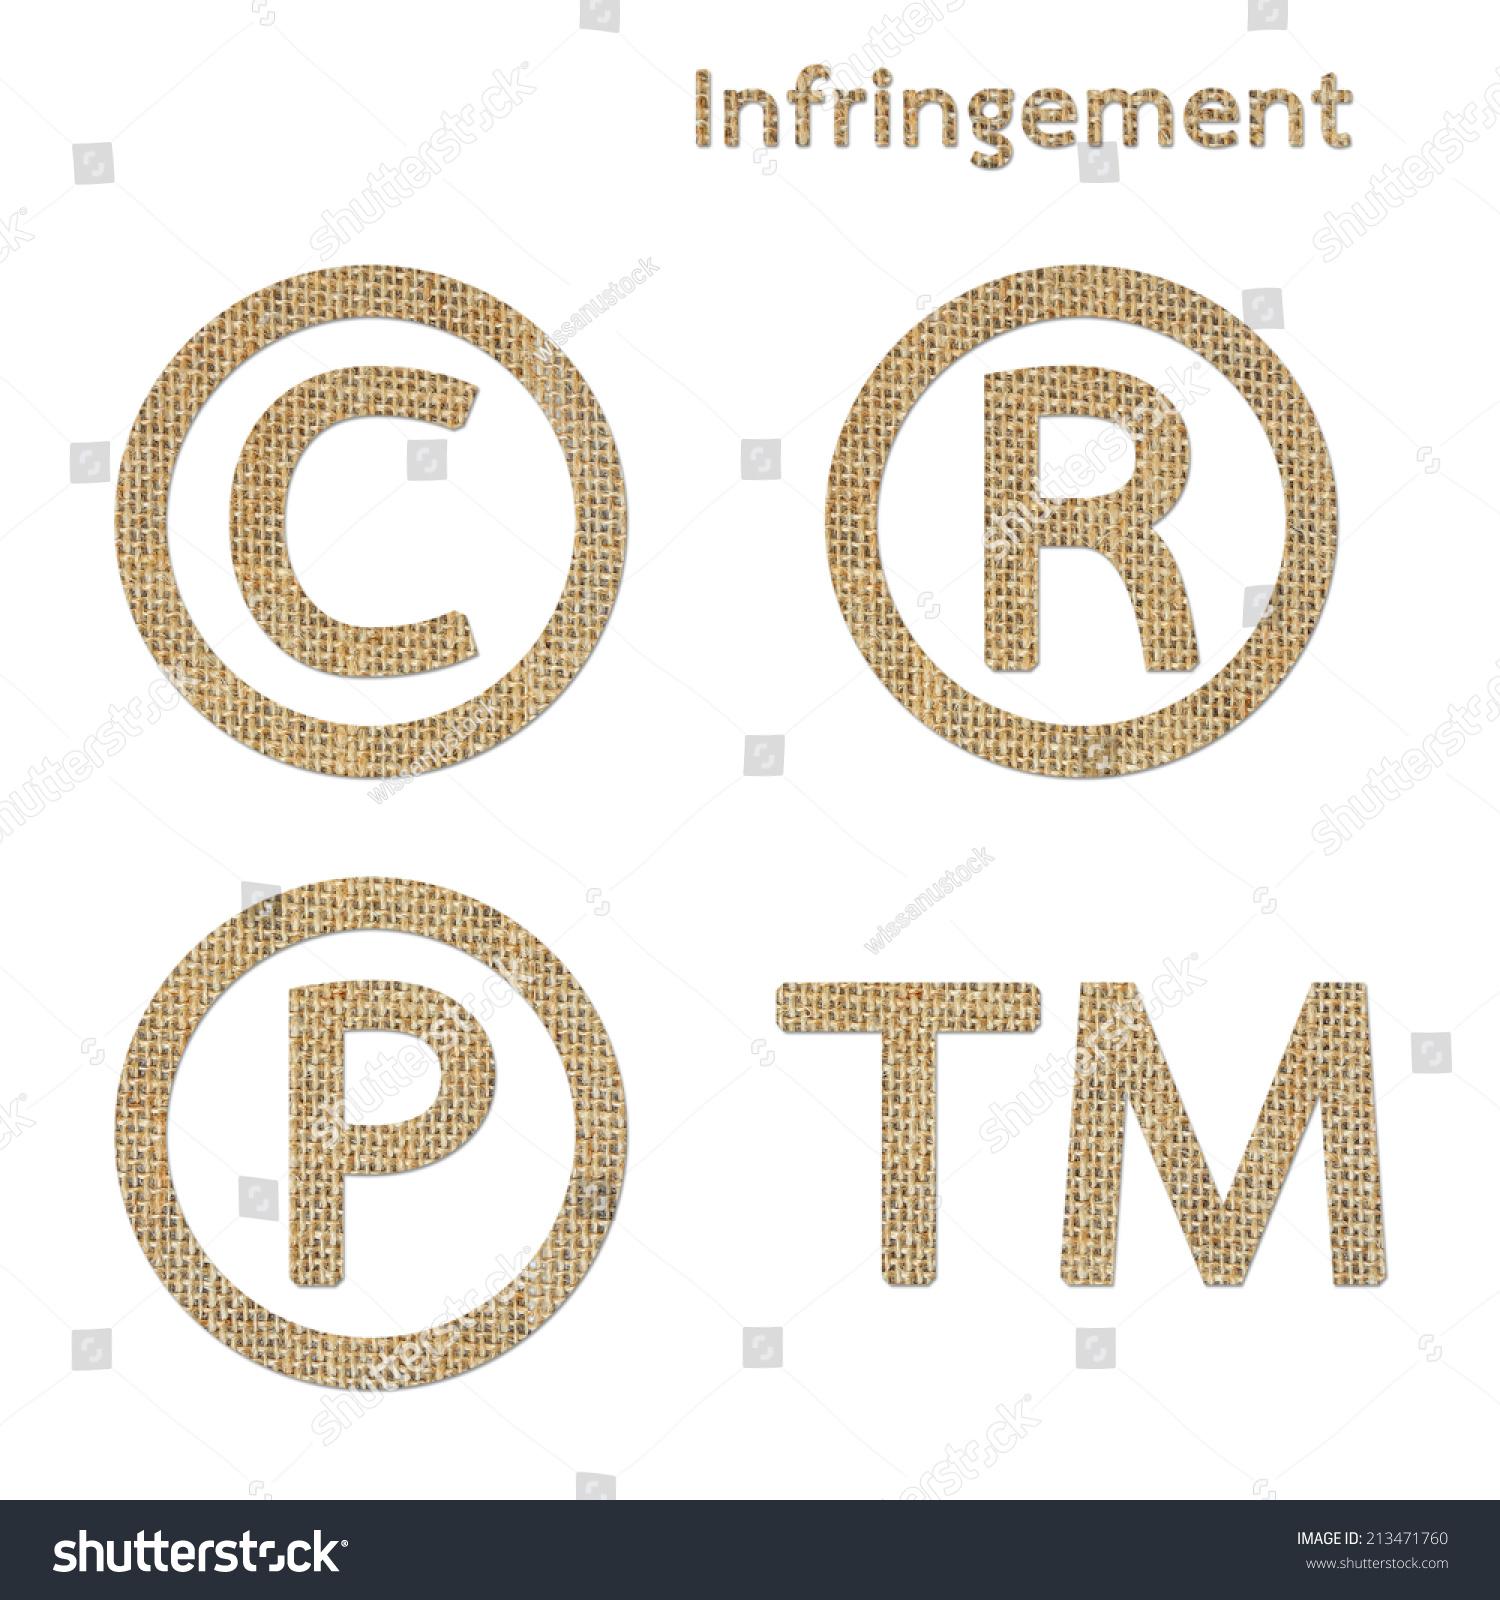 Burlap Copyright Trademark Registered Symbol Isolated Stock